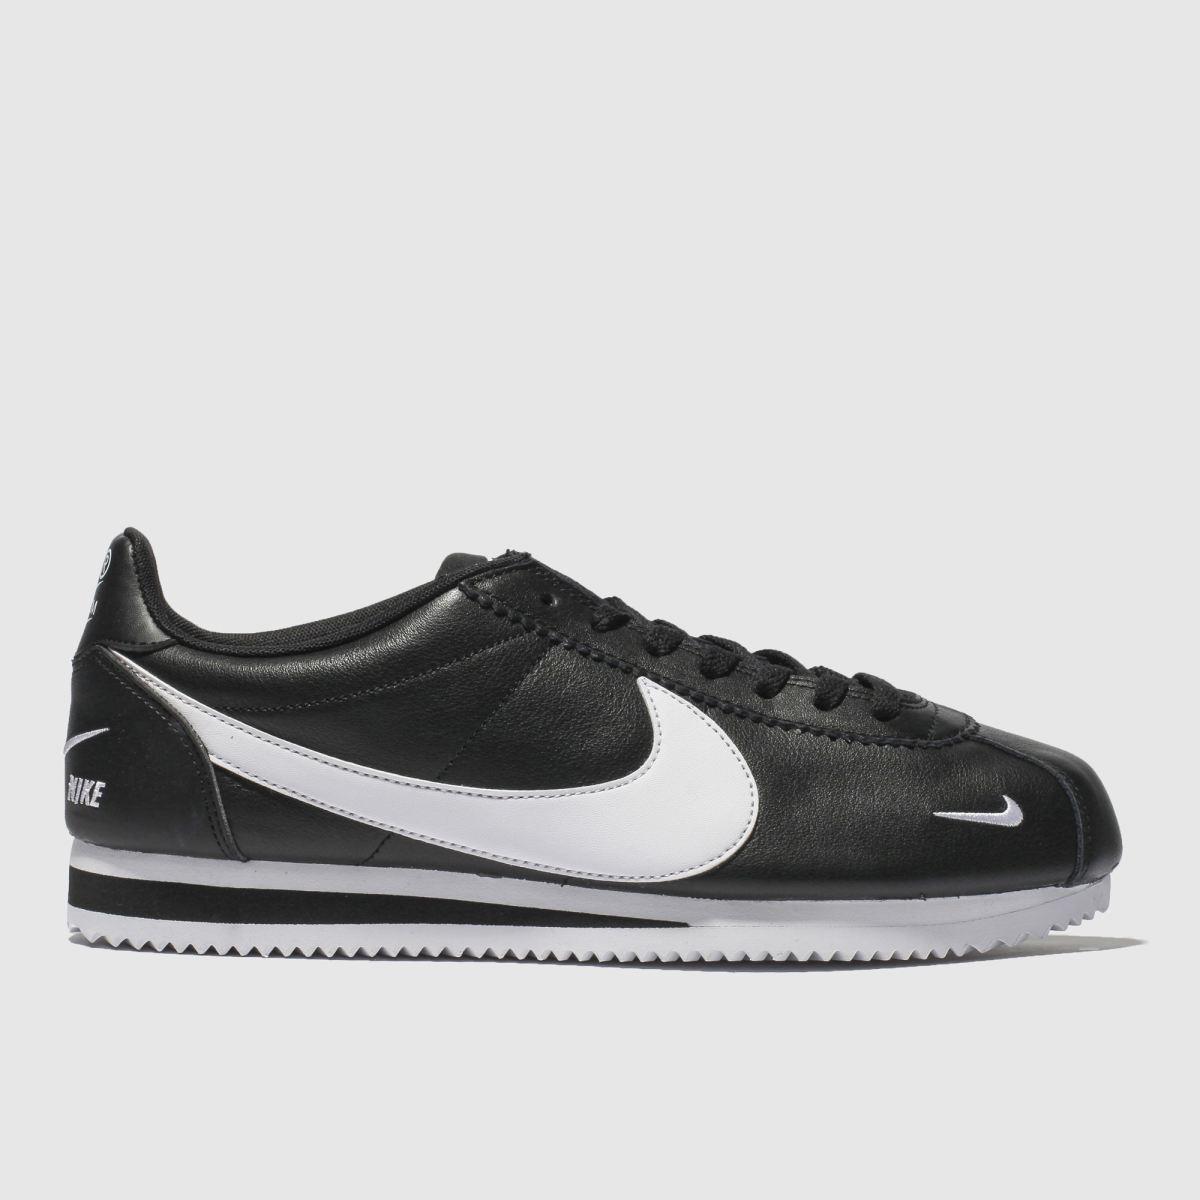 Nike Black & White Classic Cortez Premium Trainers